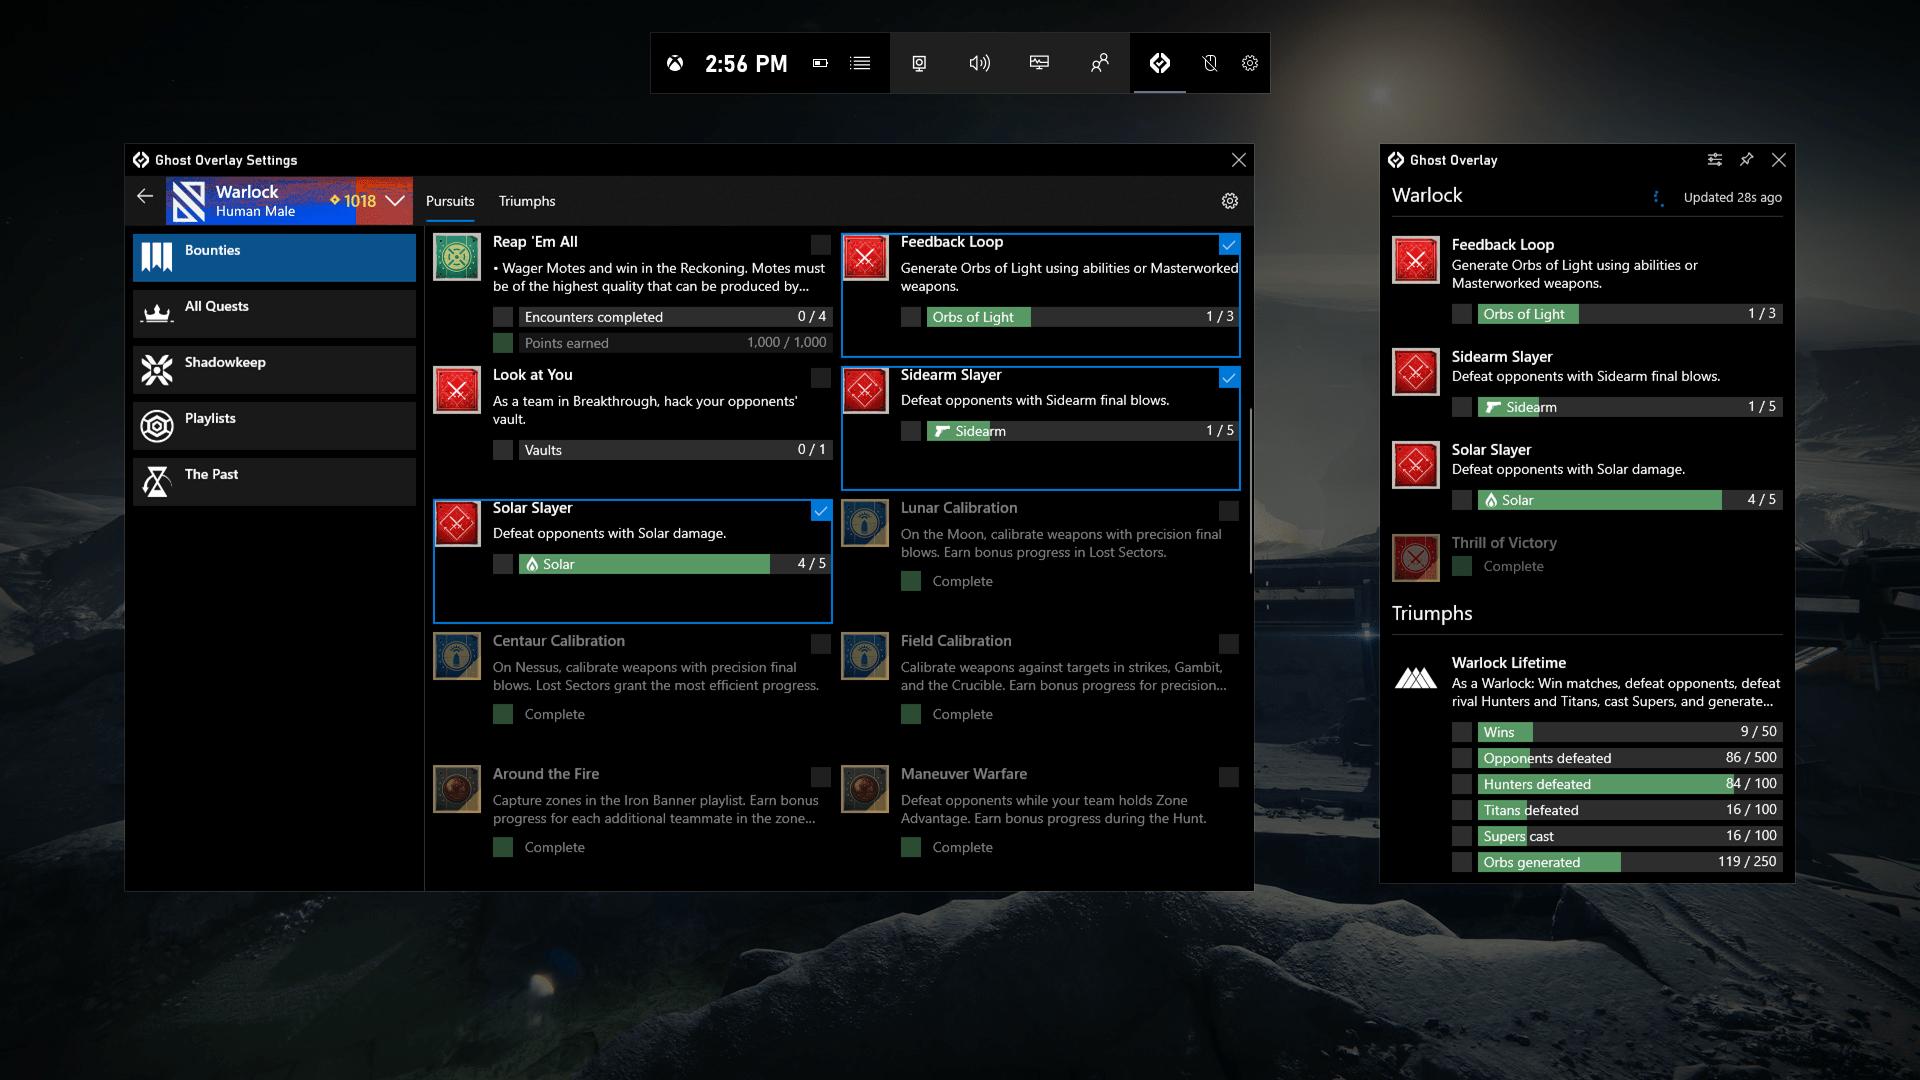 Ghost Overlay For Destiny 2